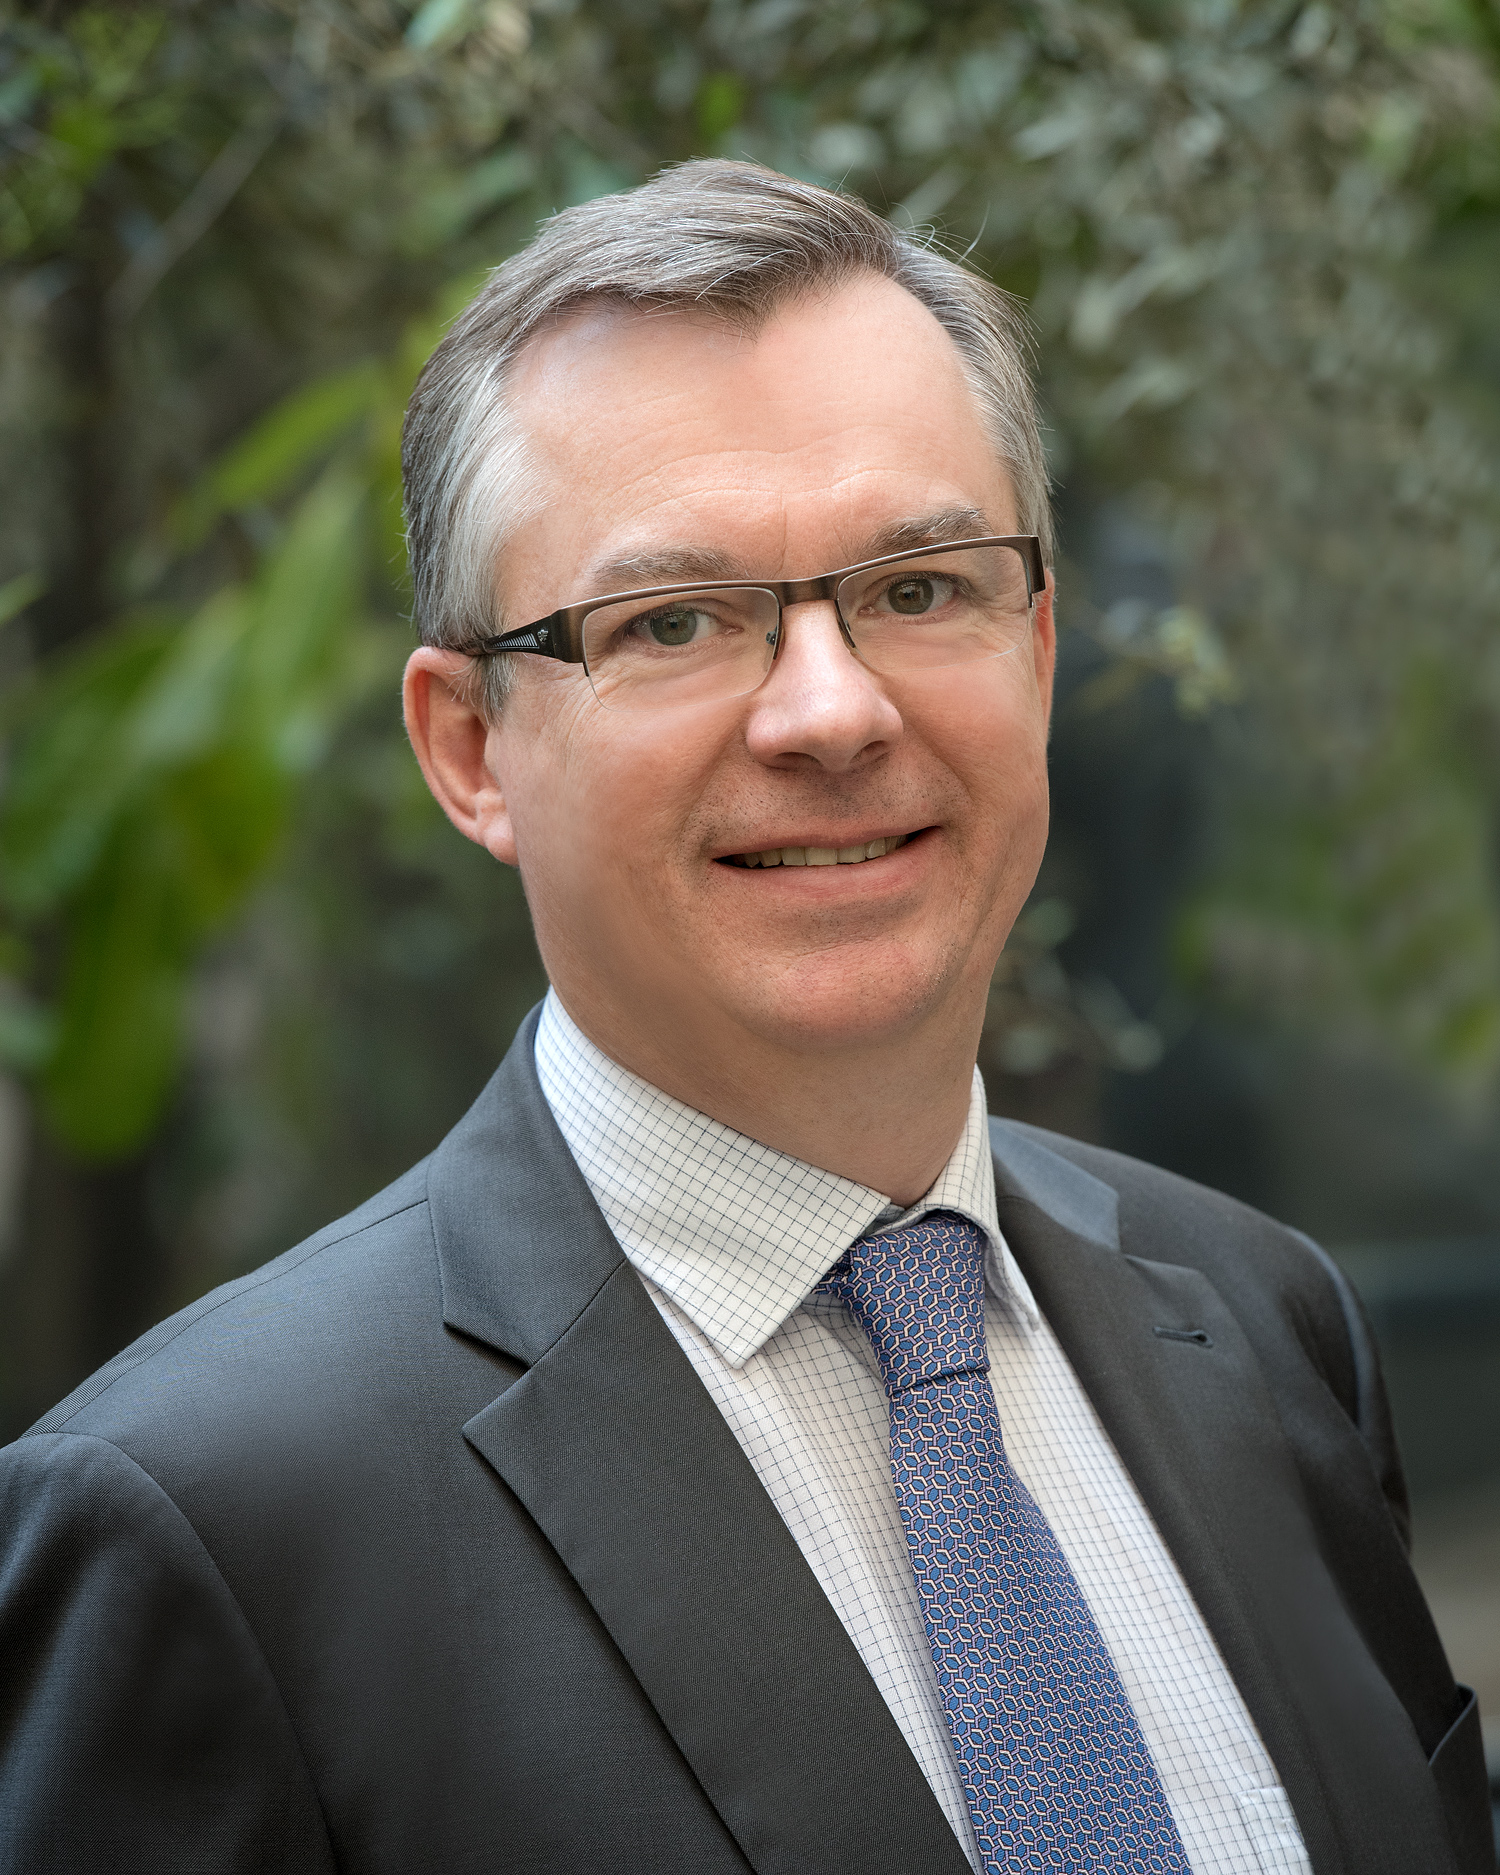 Guy Talbourdet - Delachaux CEO